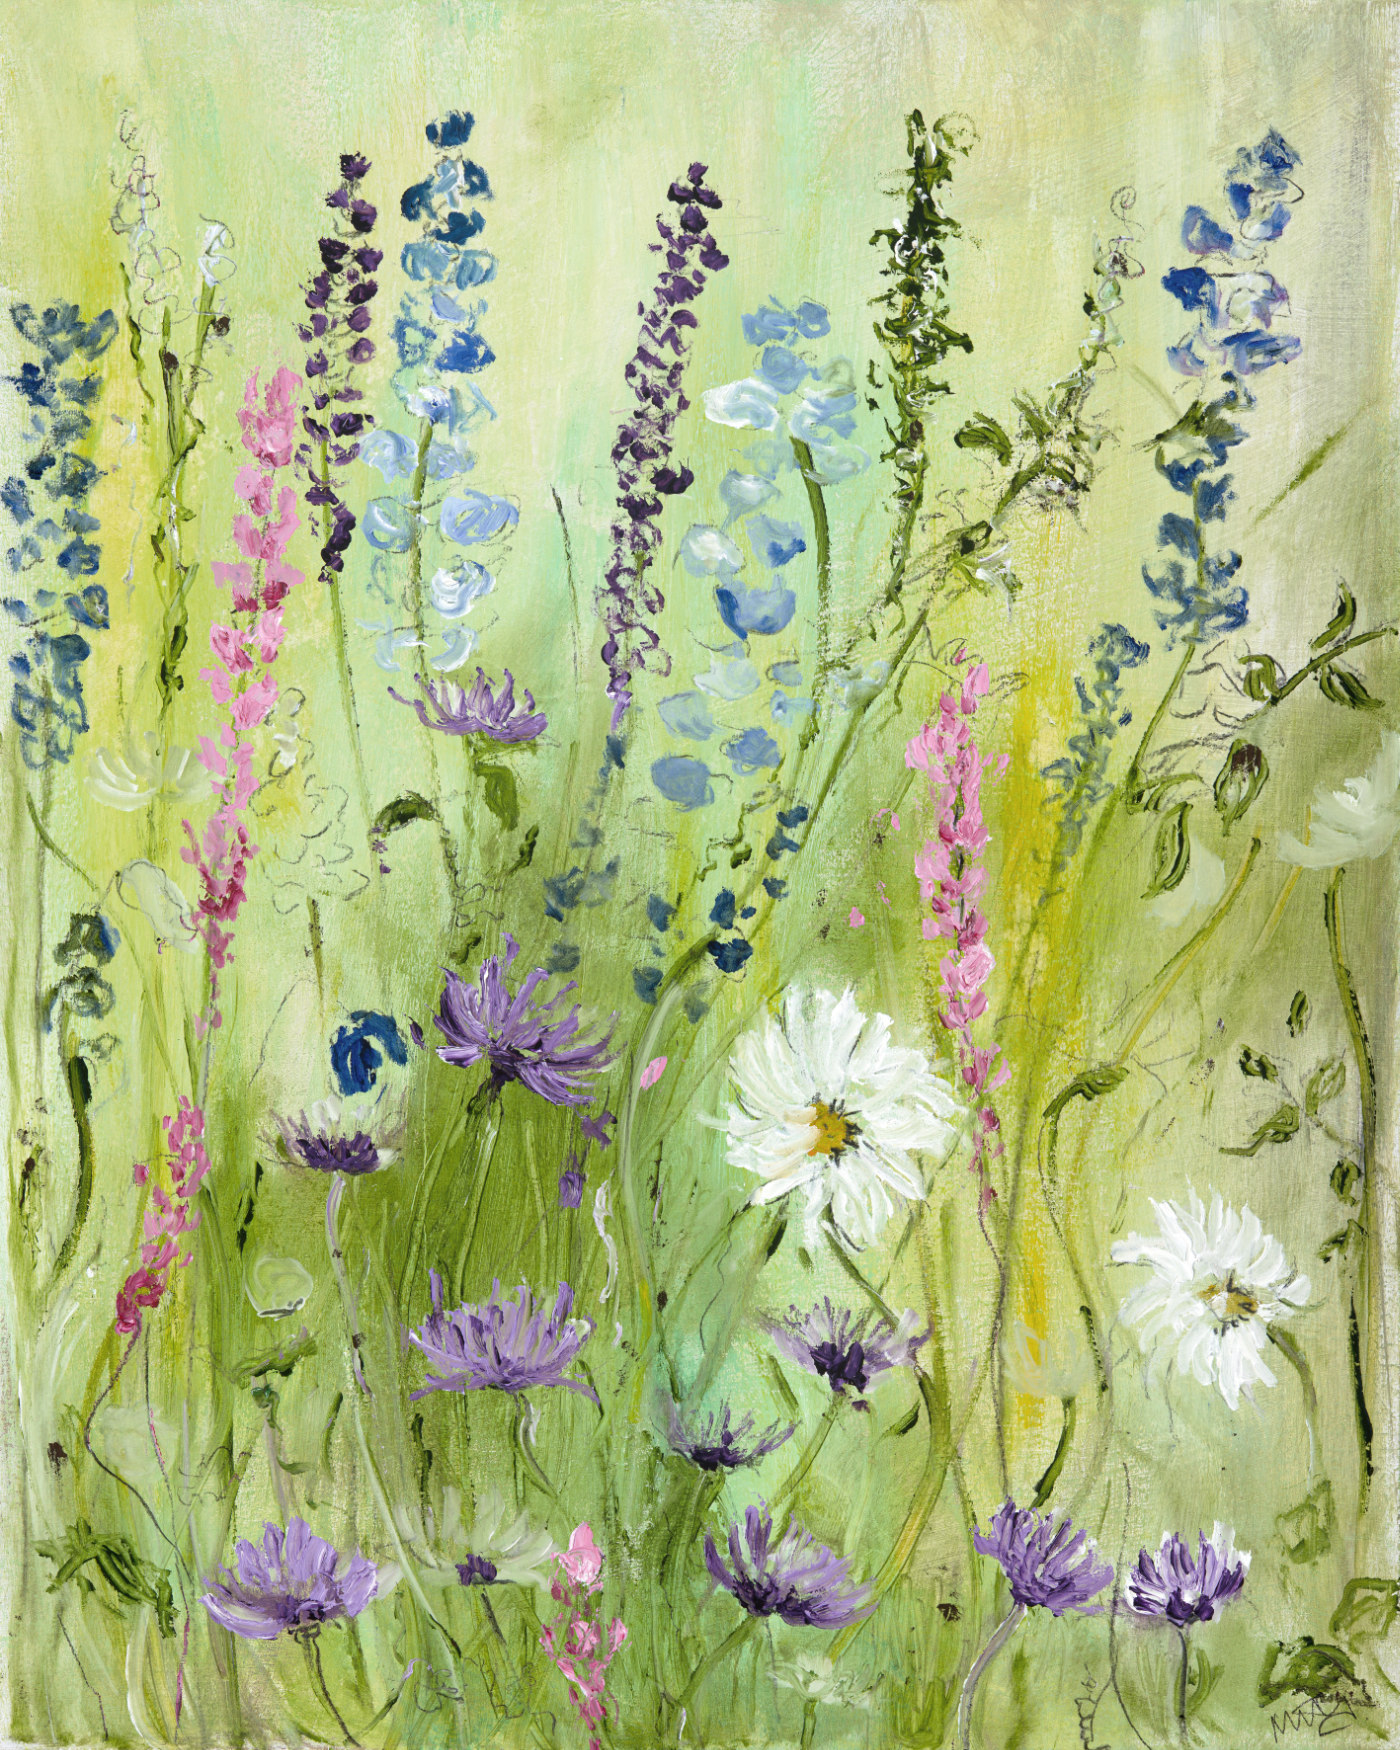 Wild Flower Field Oil Painting Art By Maureen Gillespie